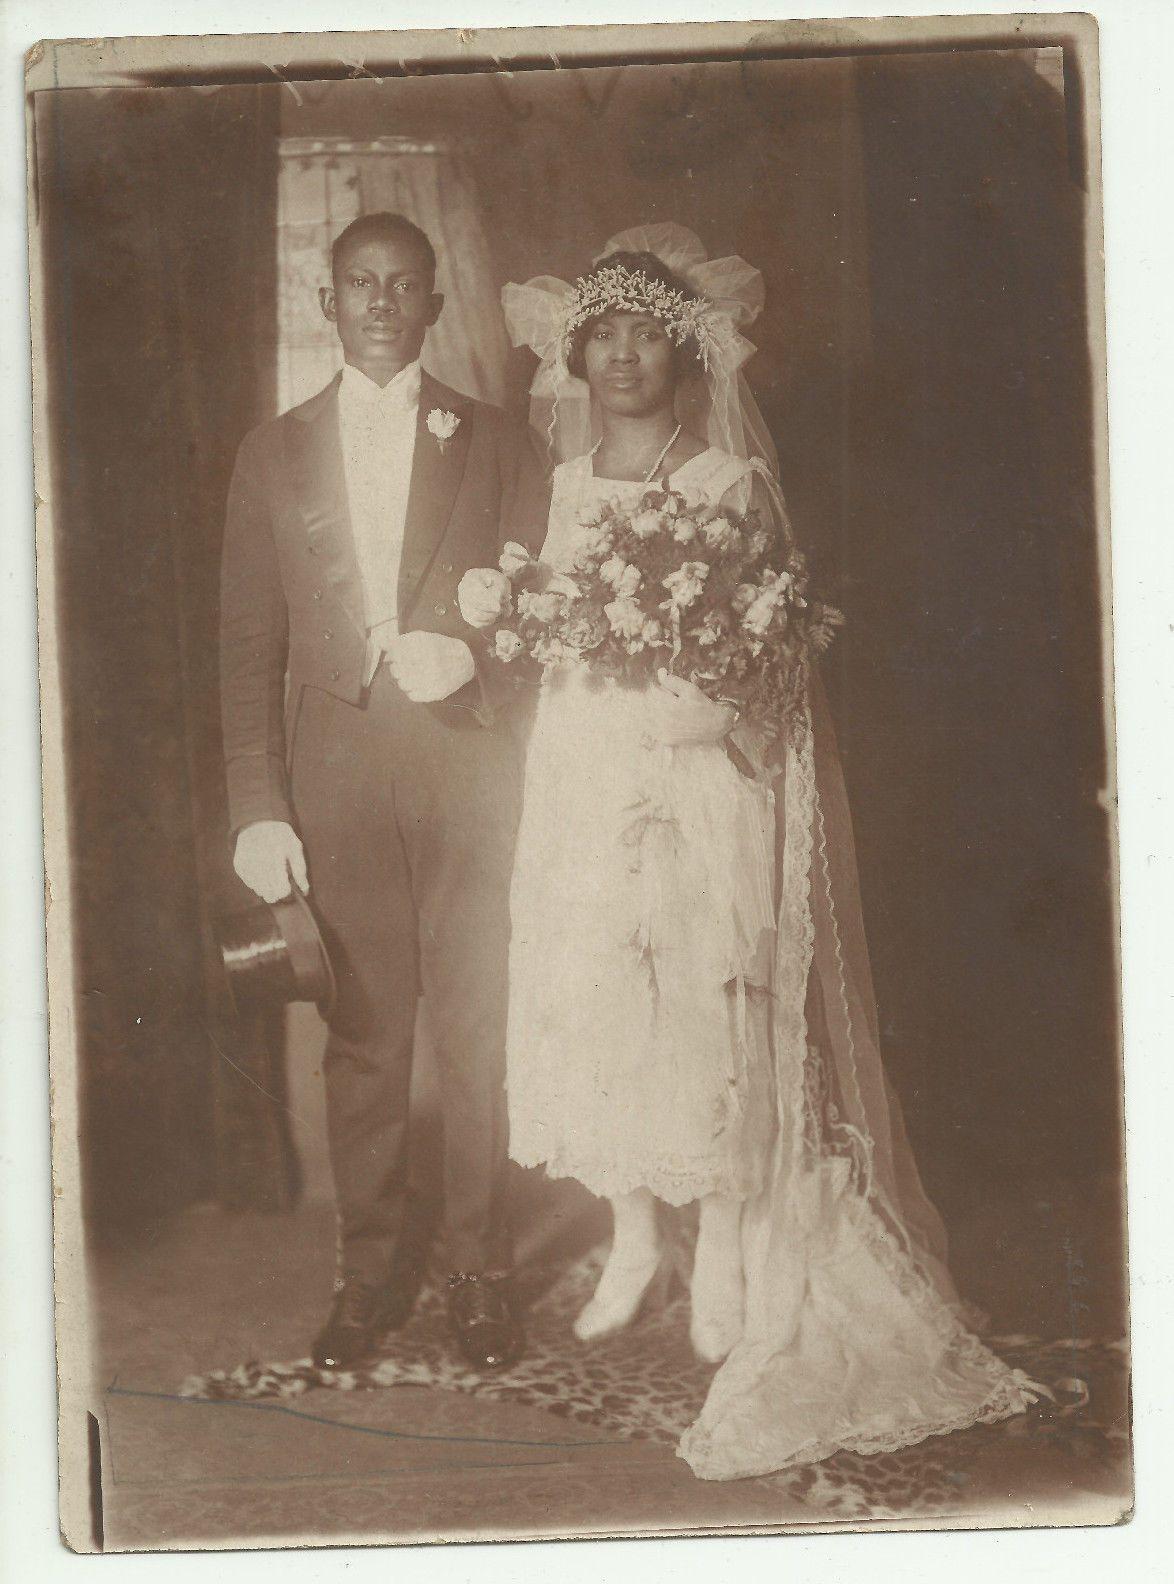 Vintage African American Bridal Couple A Vintage Studio